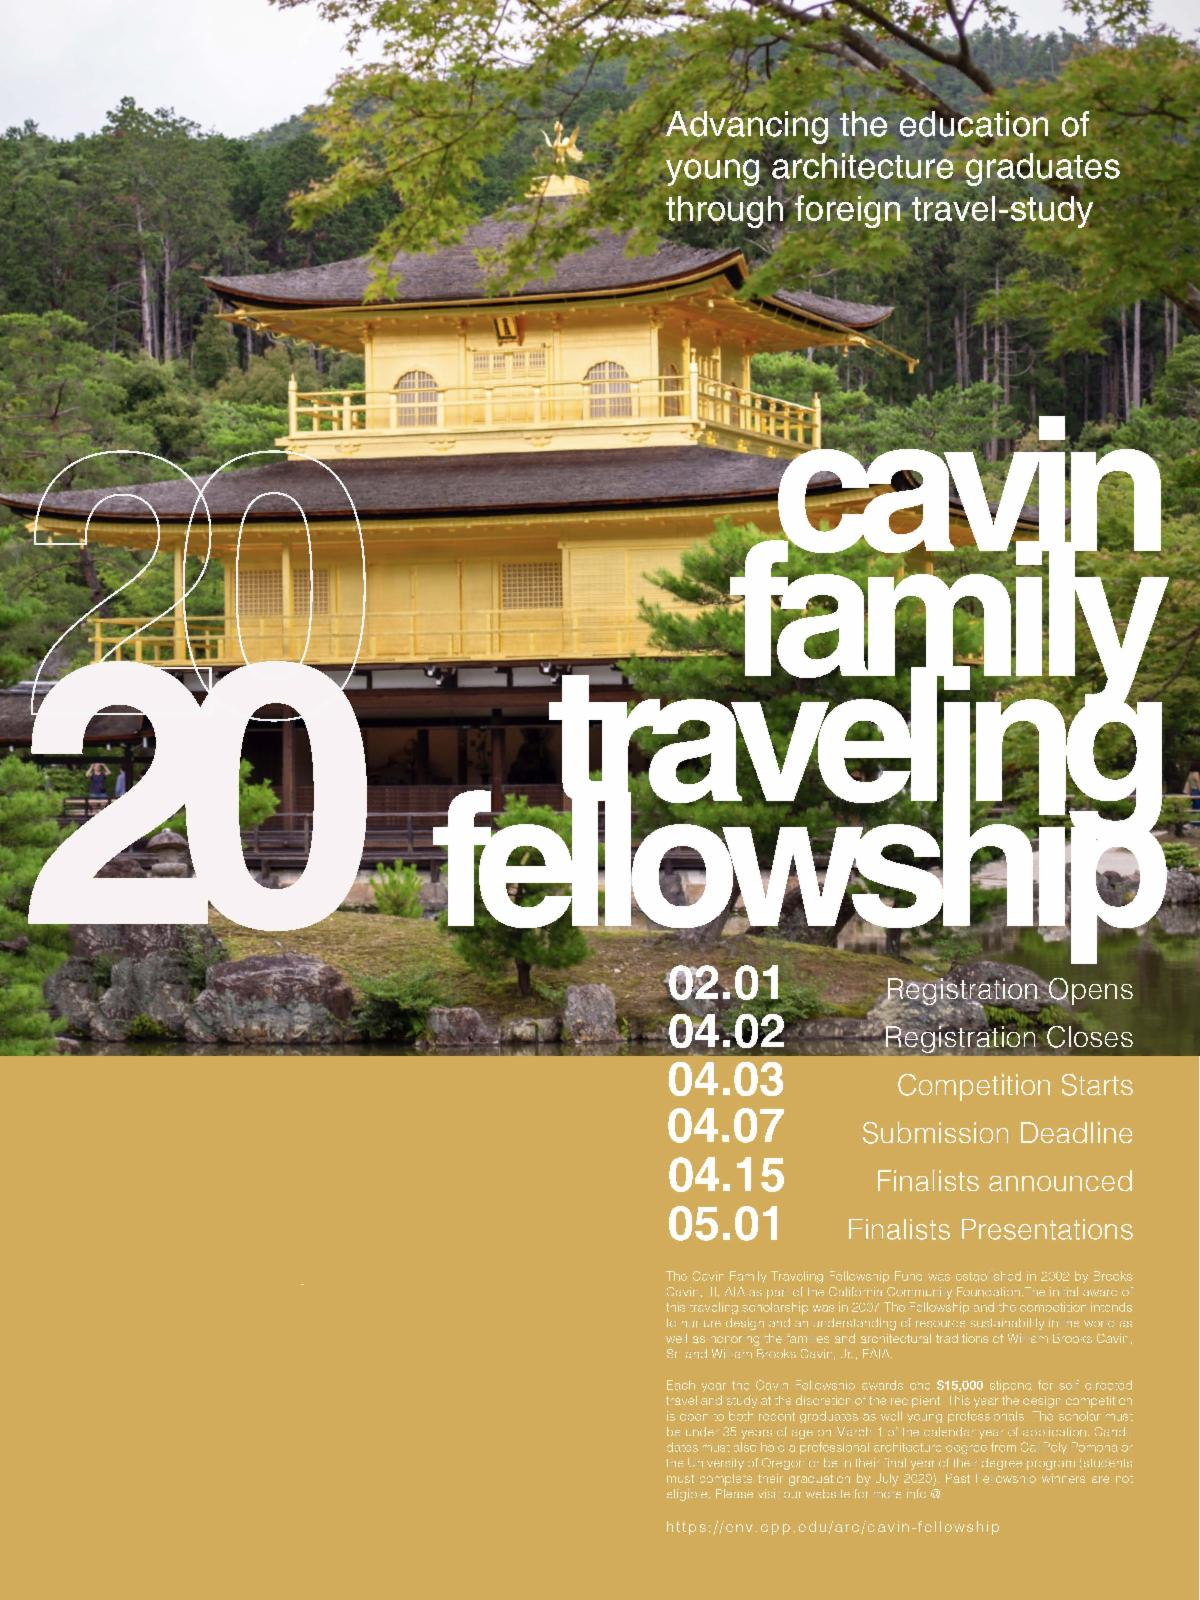 2020 cavin family traveling fellowship